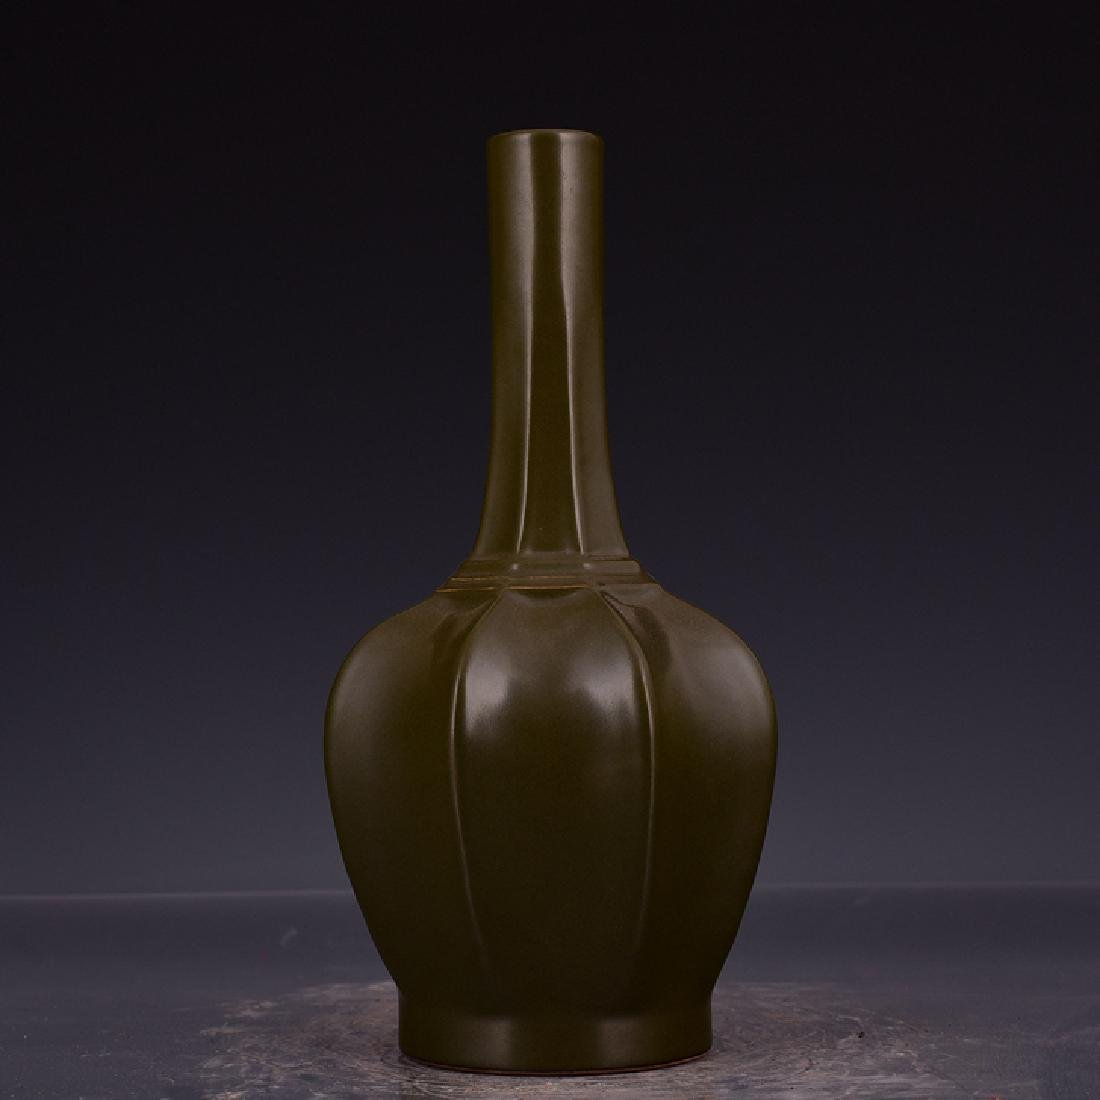 Chinese Tea Dust Glzaed Vase